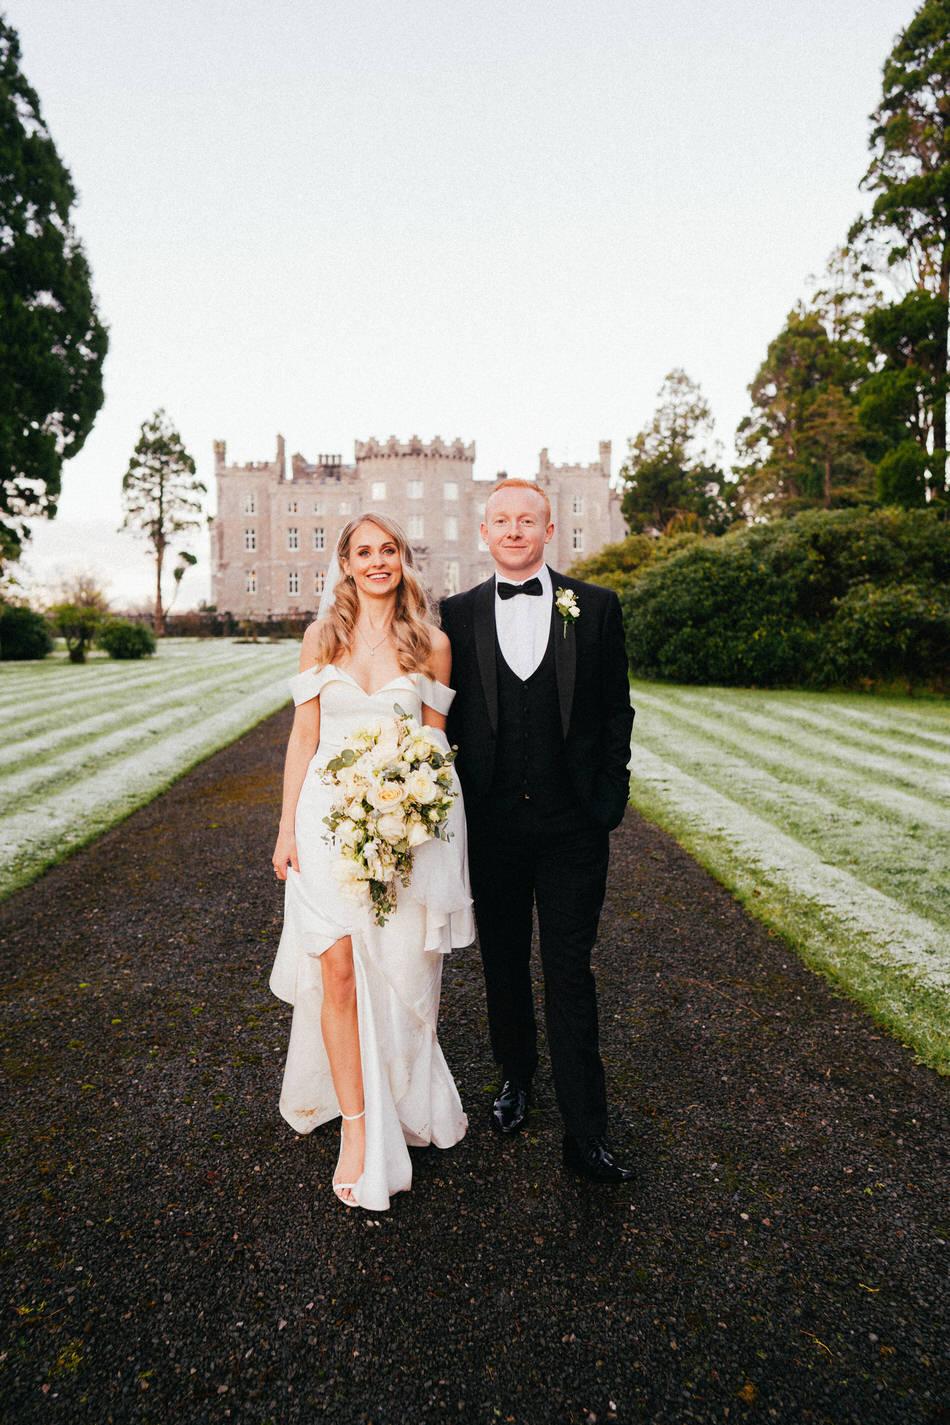 Castle-wedding-ireland-photos- 0220 160